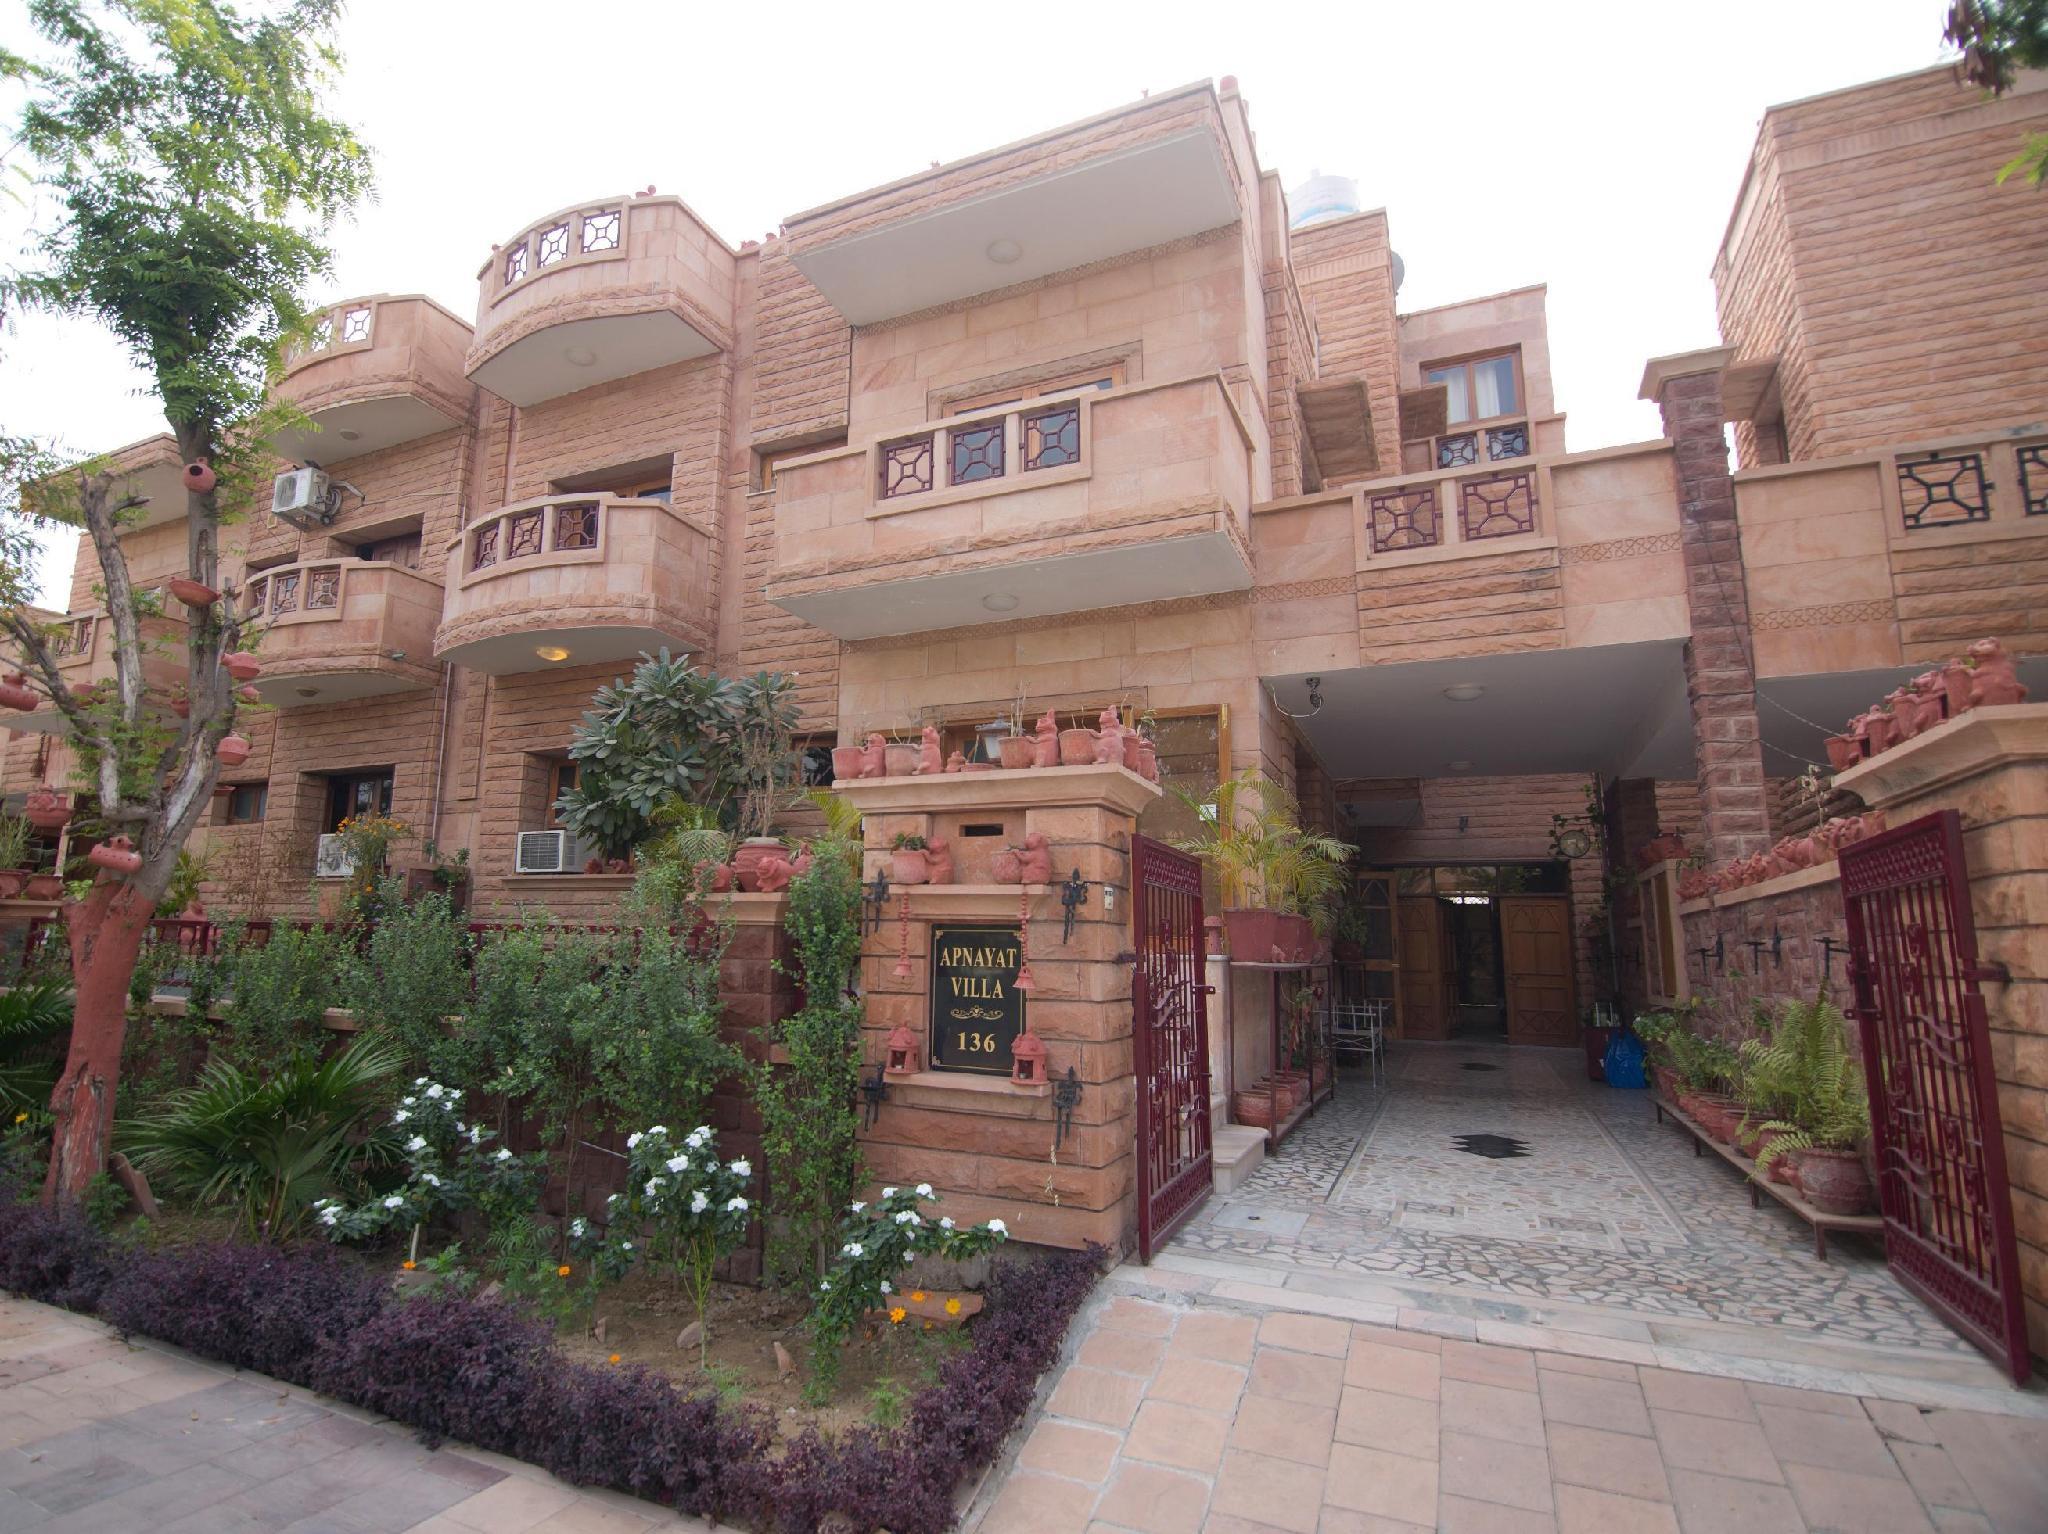 Apnayt Villa   A Luxury Homestay